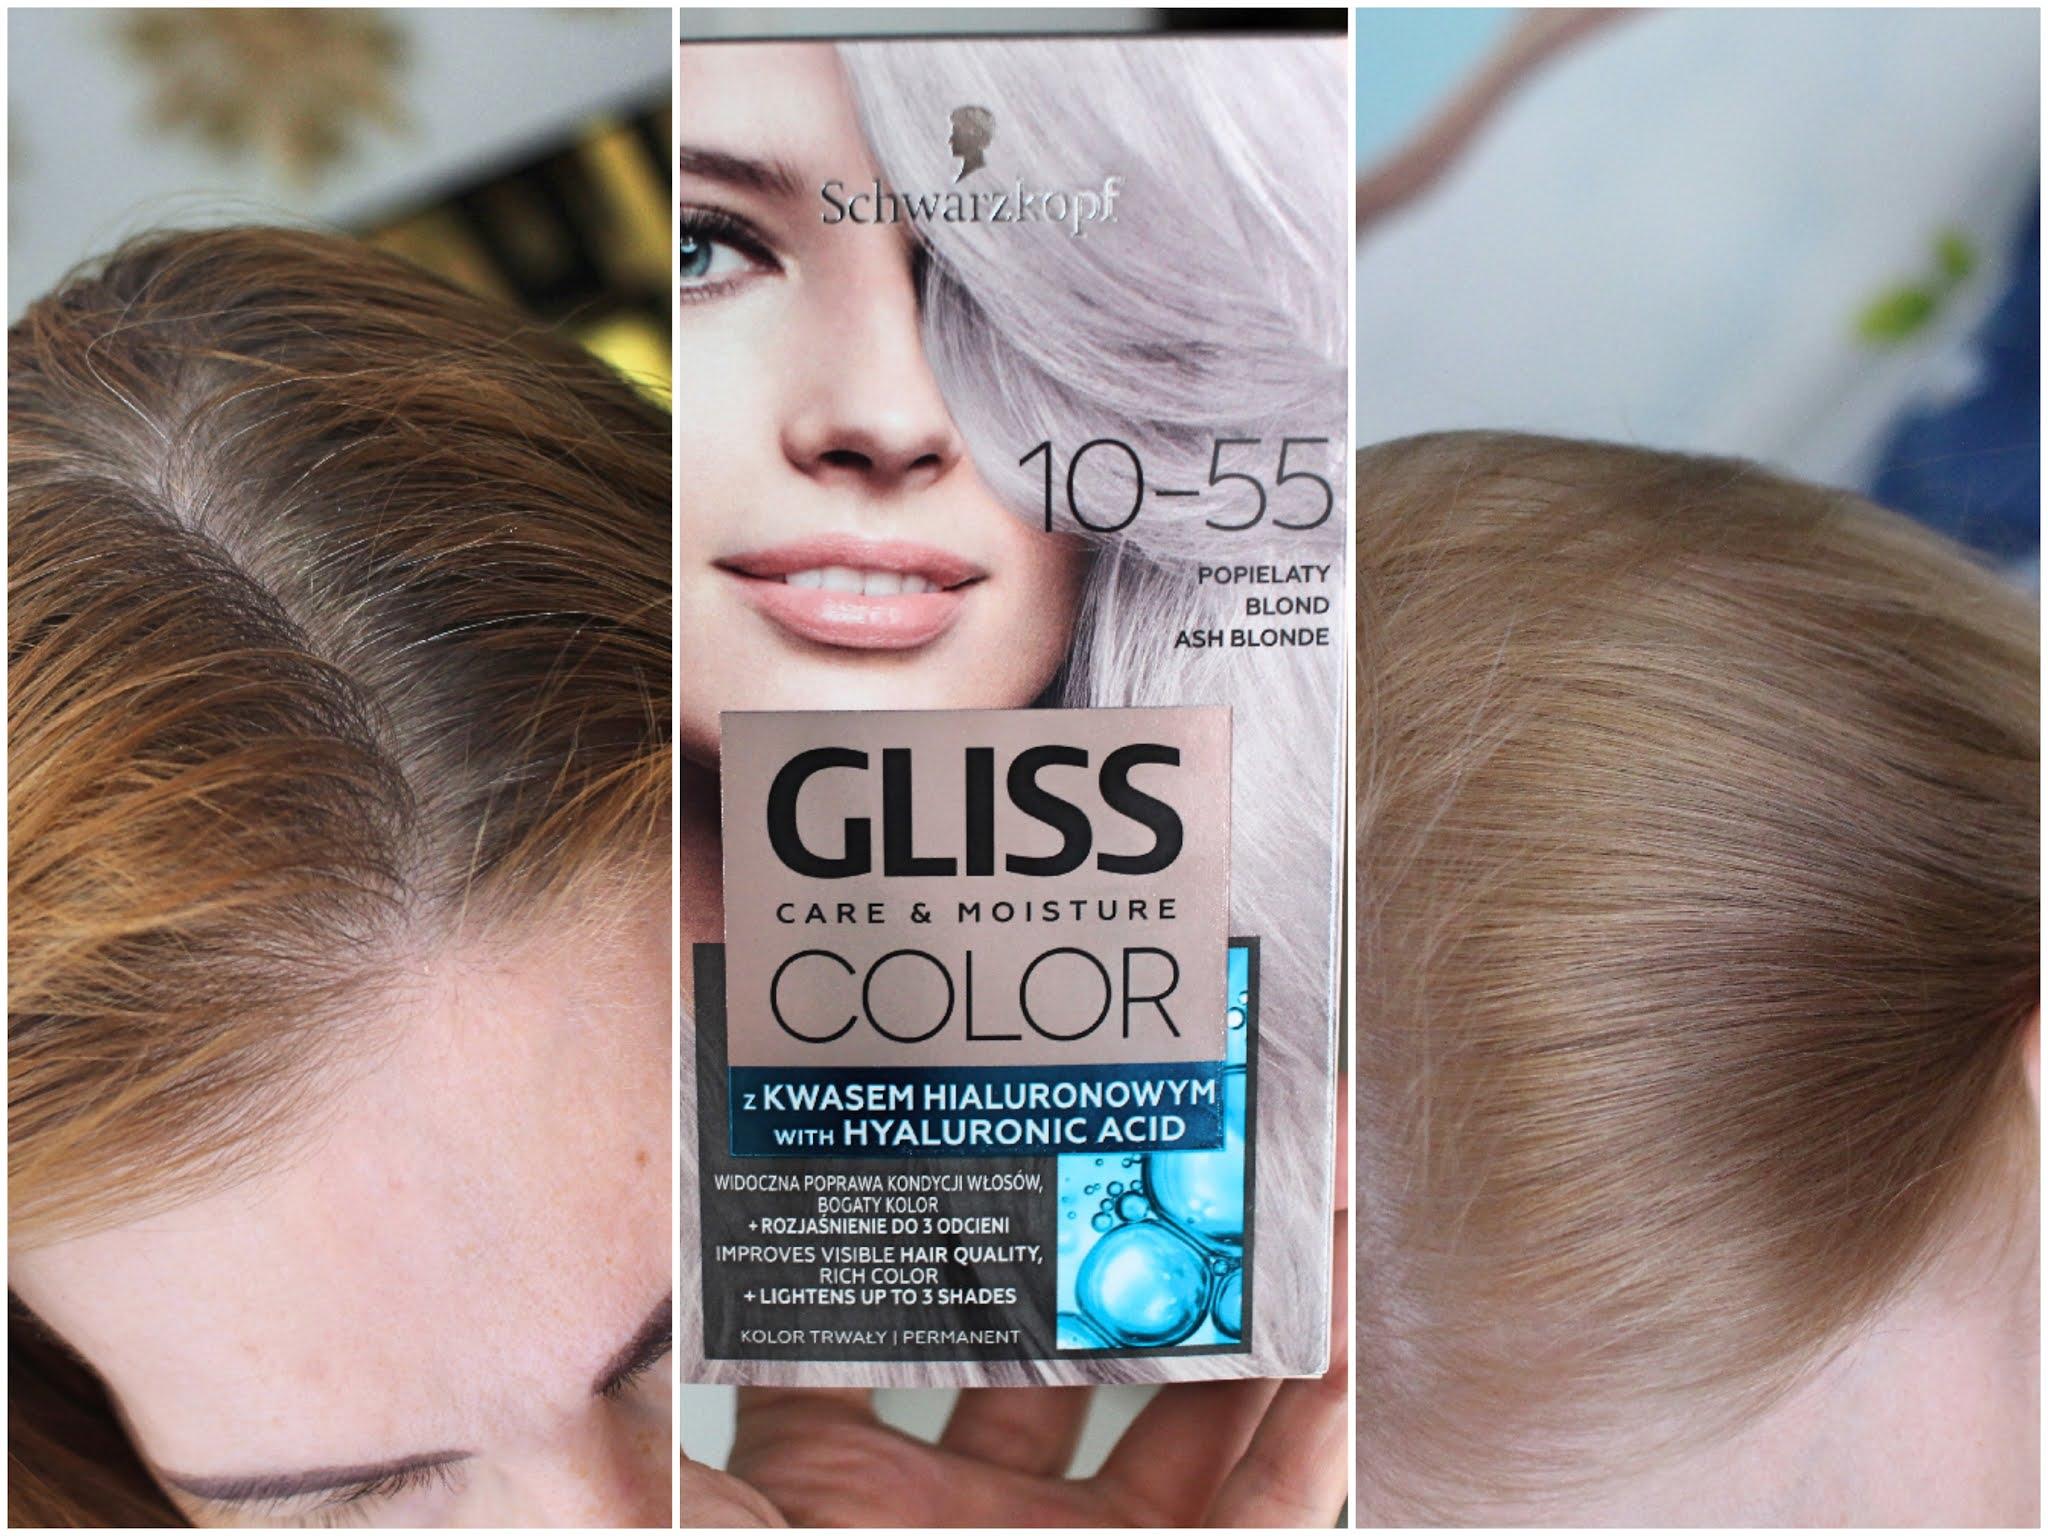 GLISS COLOR 10-55 popielaty blond - ash blonde